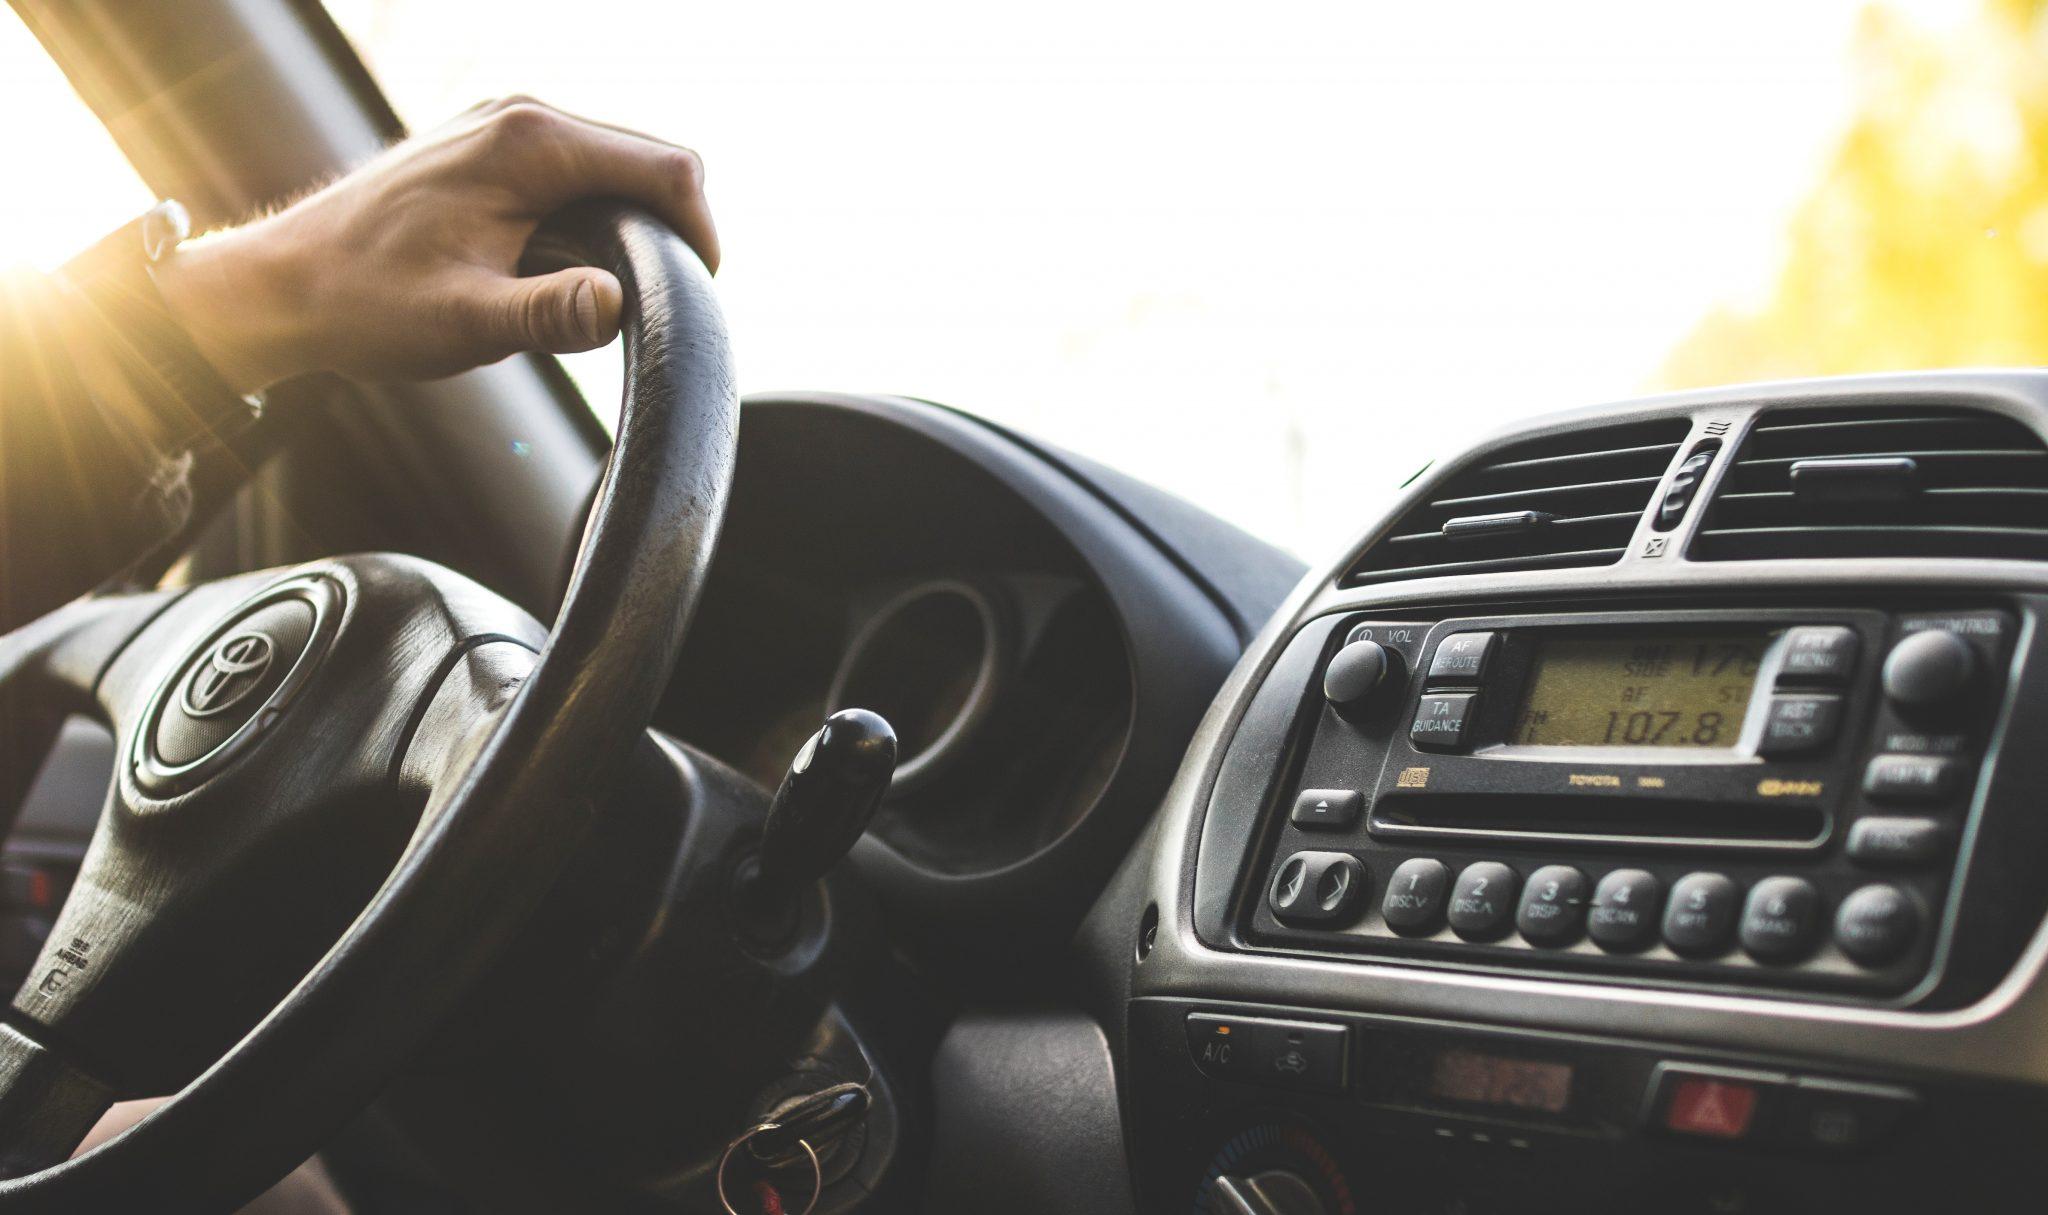 Quelle assurance auto choisir en 2021 ?